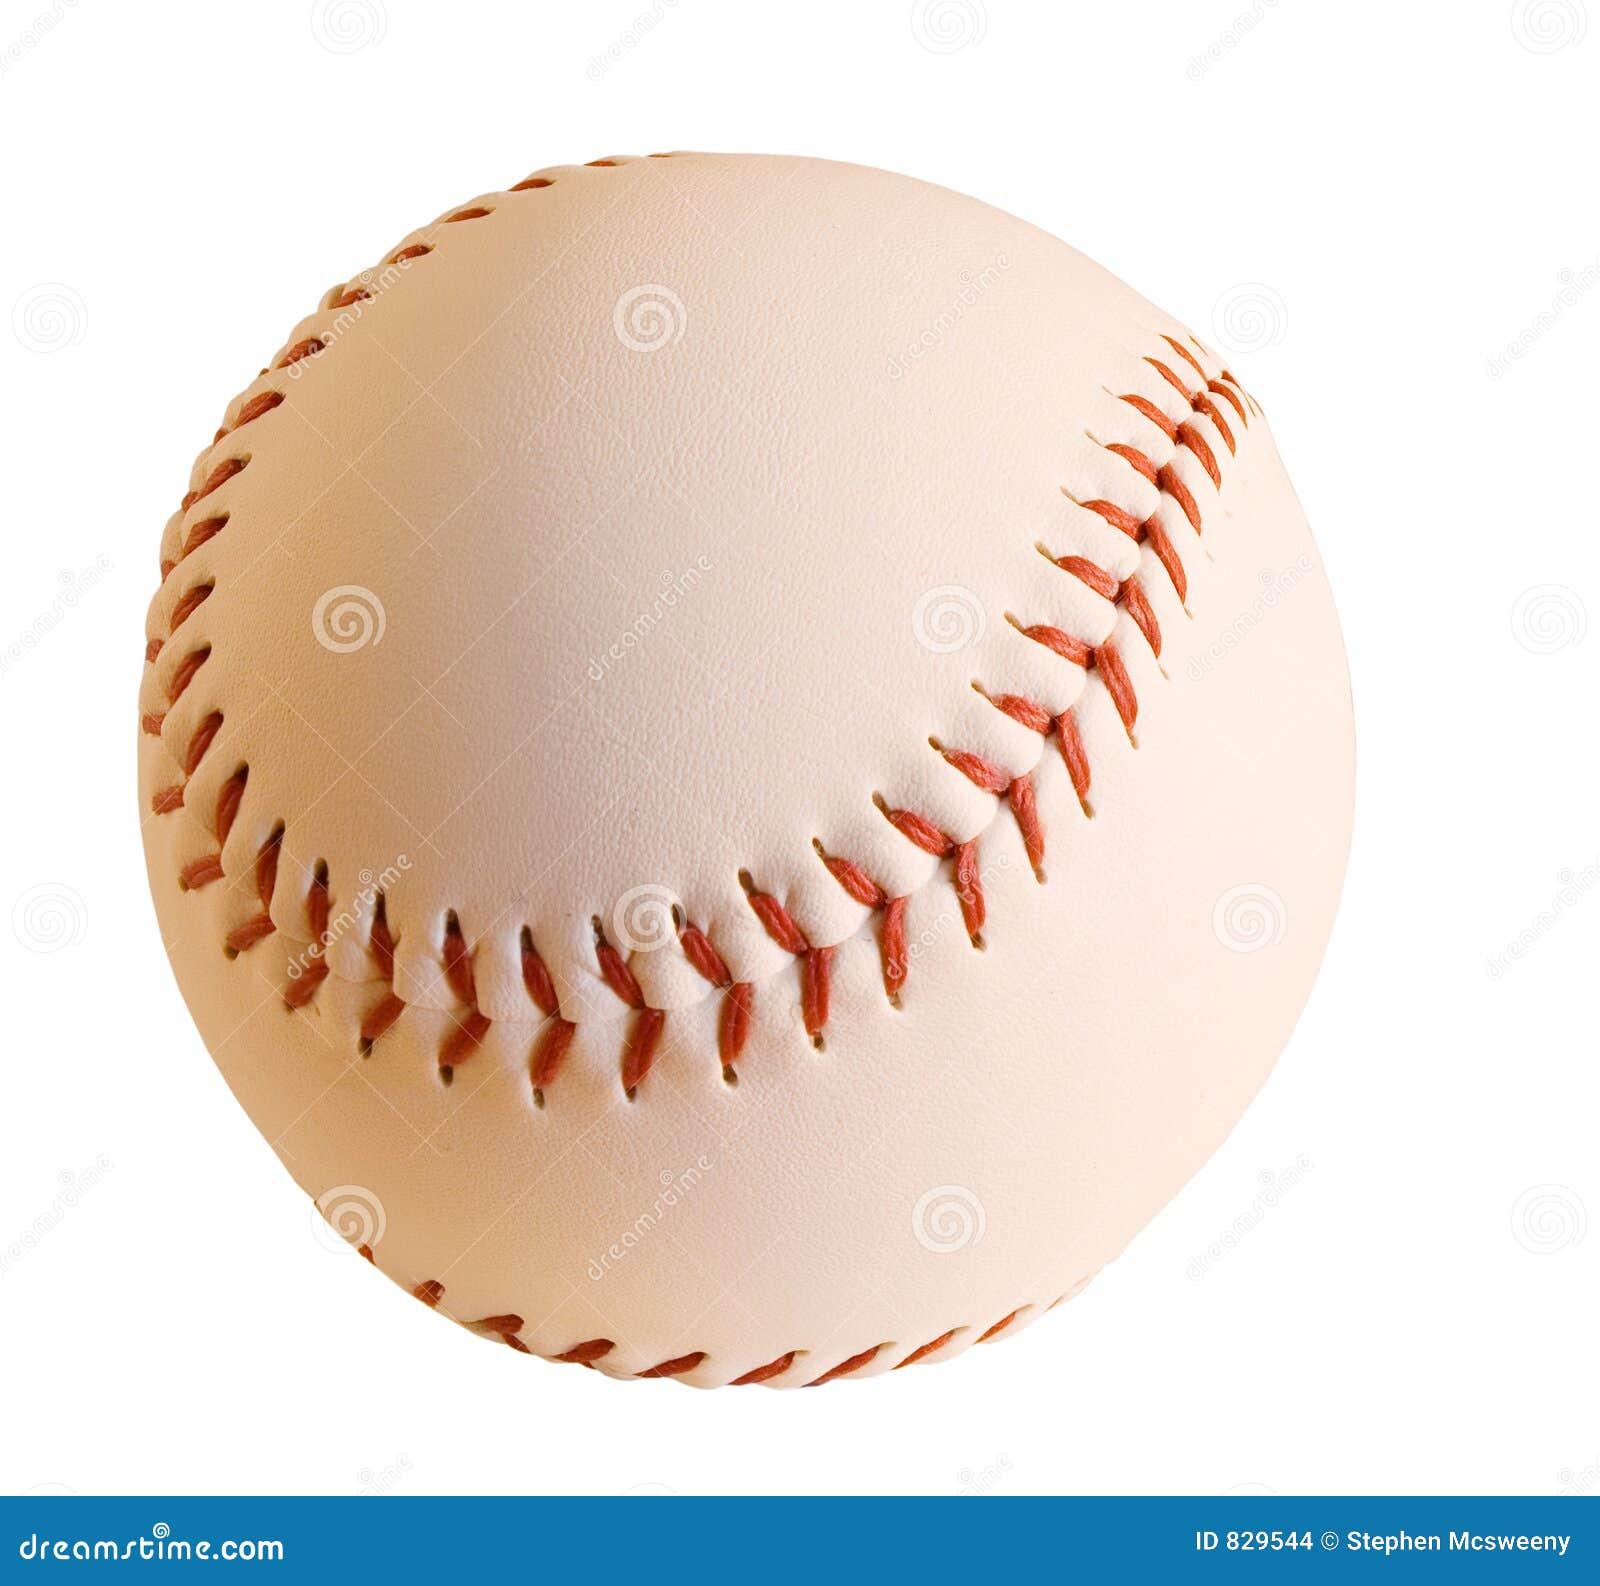 Isolated baseball